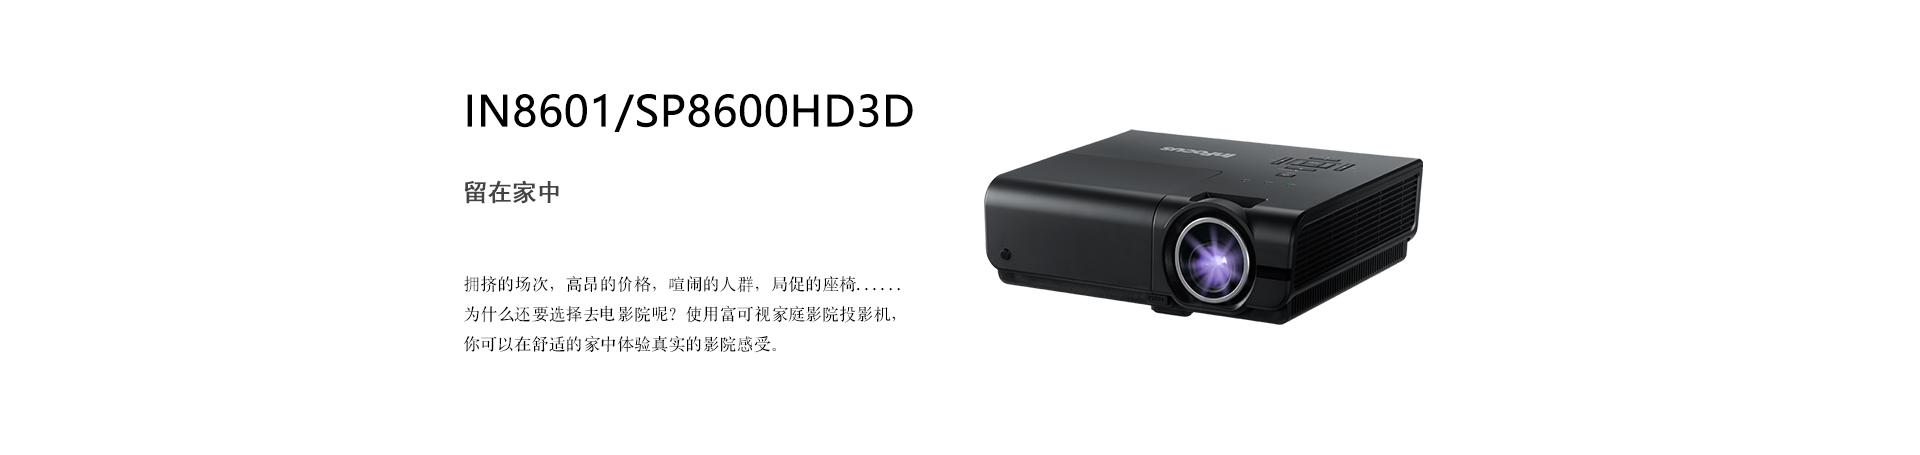 IN8601/SP8600HD3D